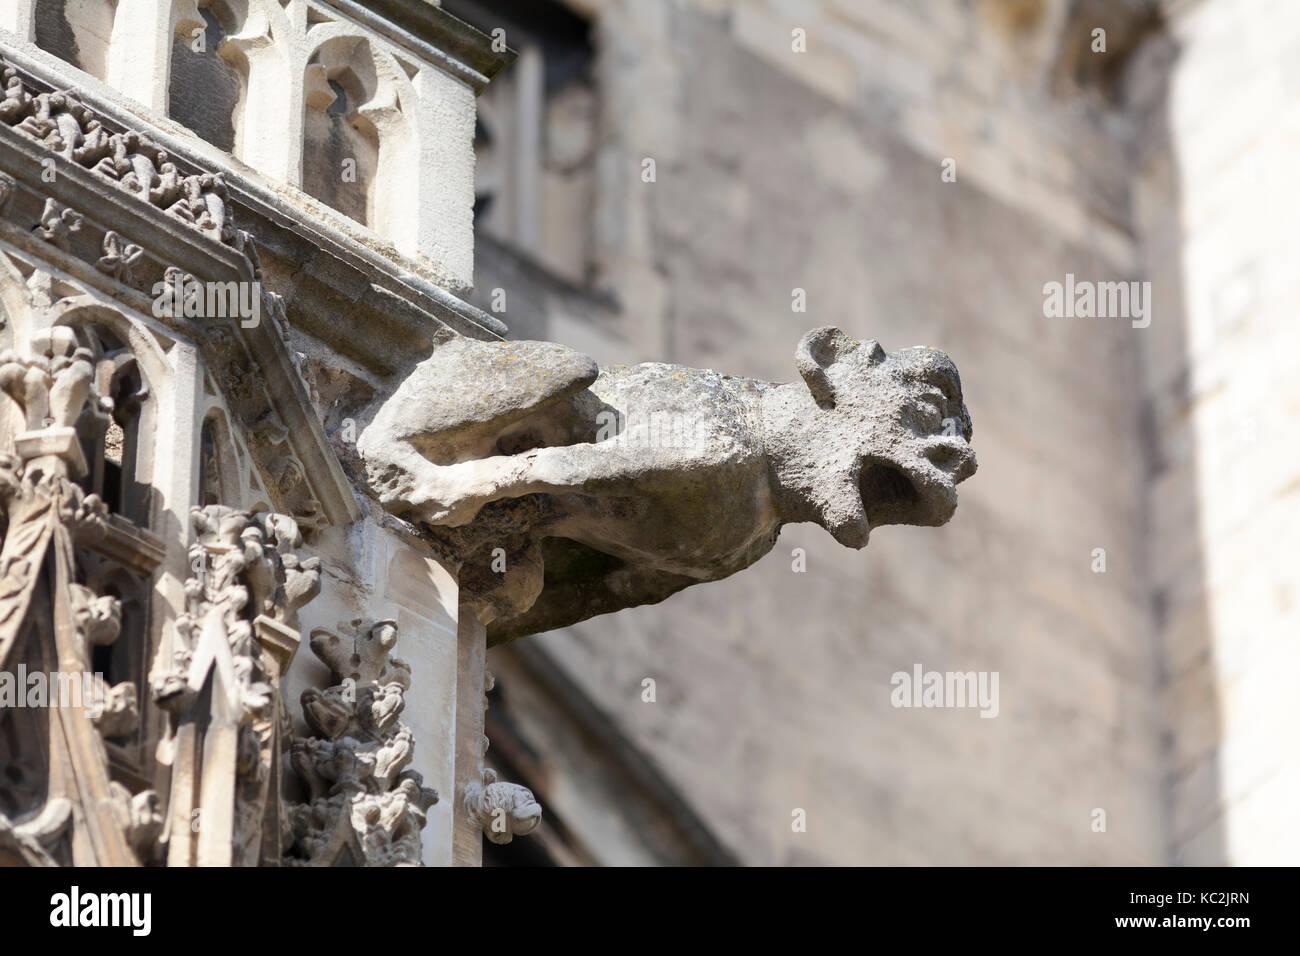 UK, Cantebury, stone gargoil on Cantebury cathedral. - Stock Image